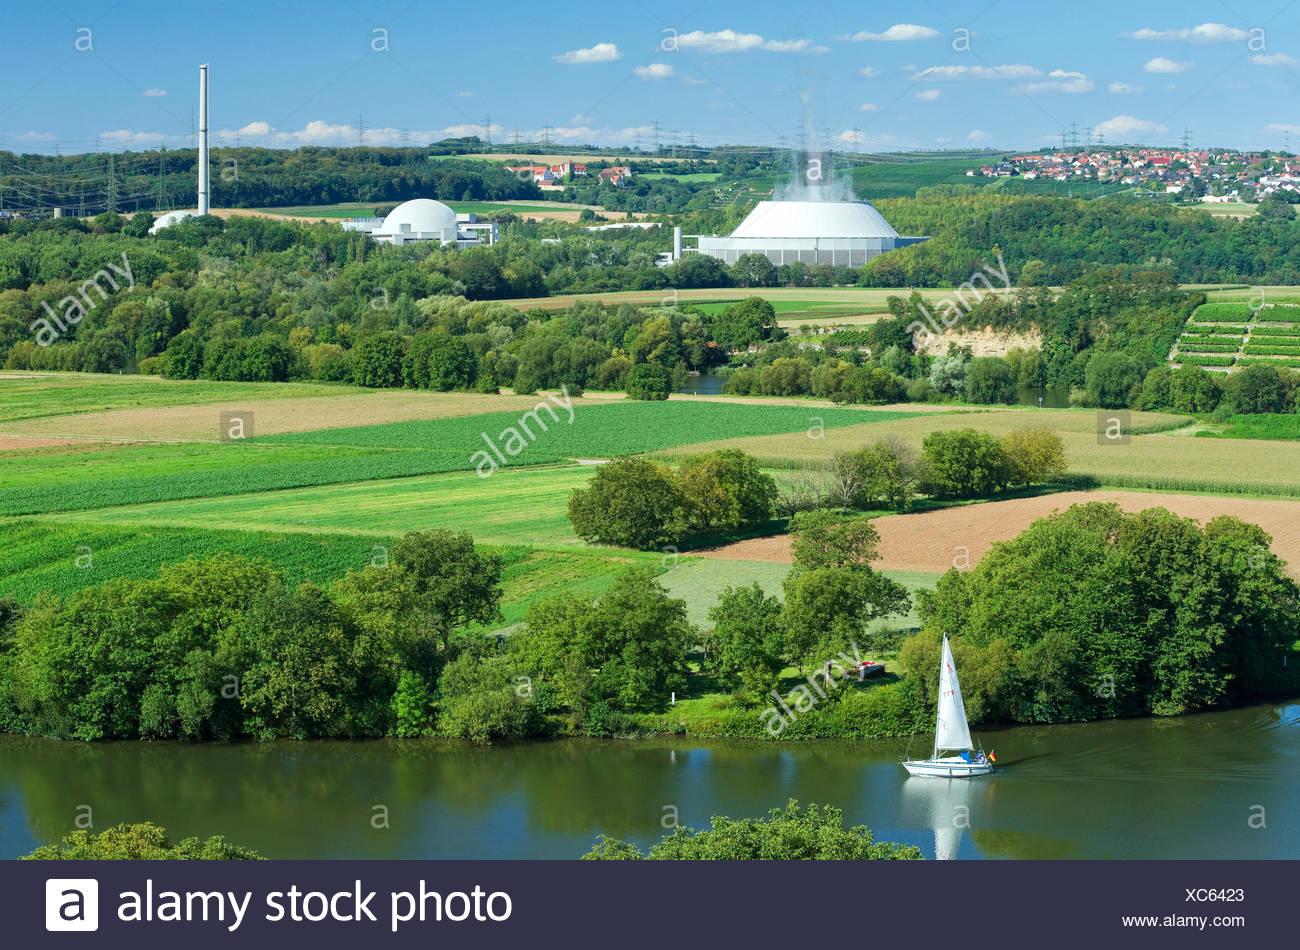 Germany, Baden-Wurttemberg, Neckar west home, nuclear power plant Neckar west home, EnBW Kernkraft GmbH, view from the vineyards near home Kirch on the Neckar - Stock Image